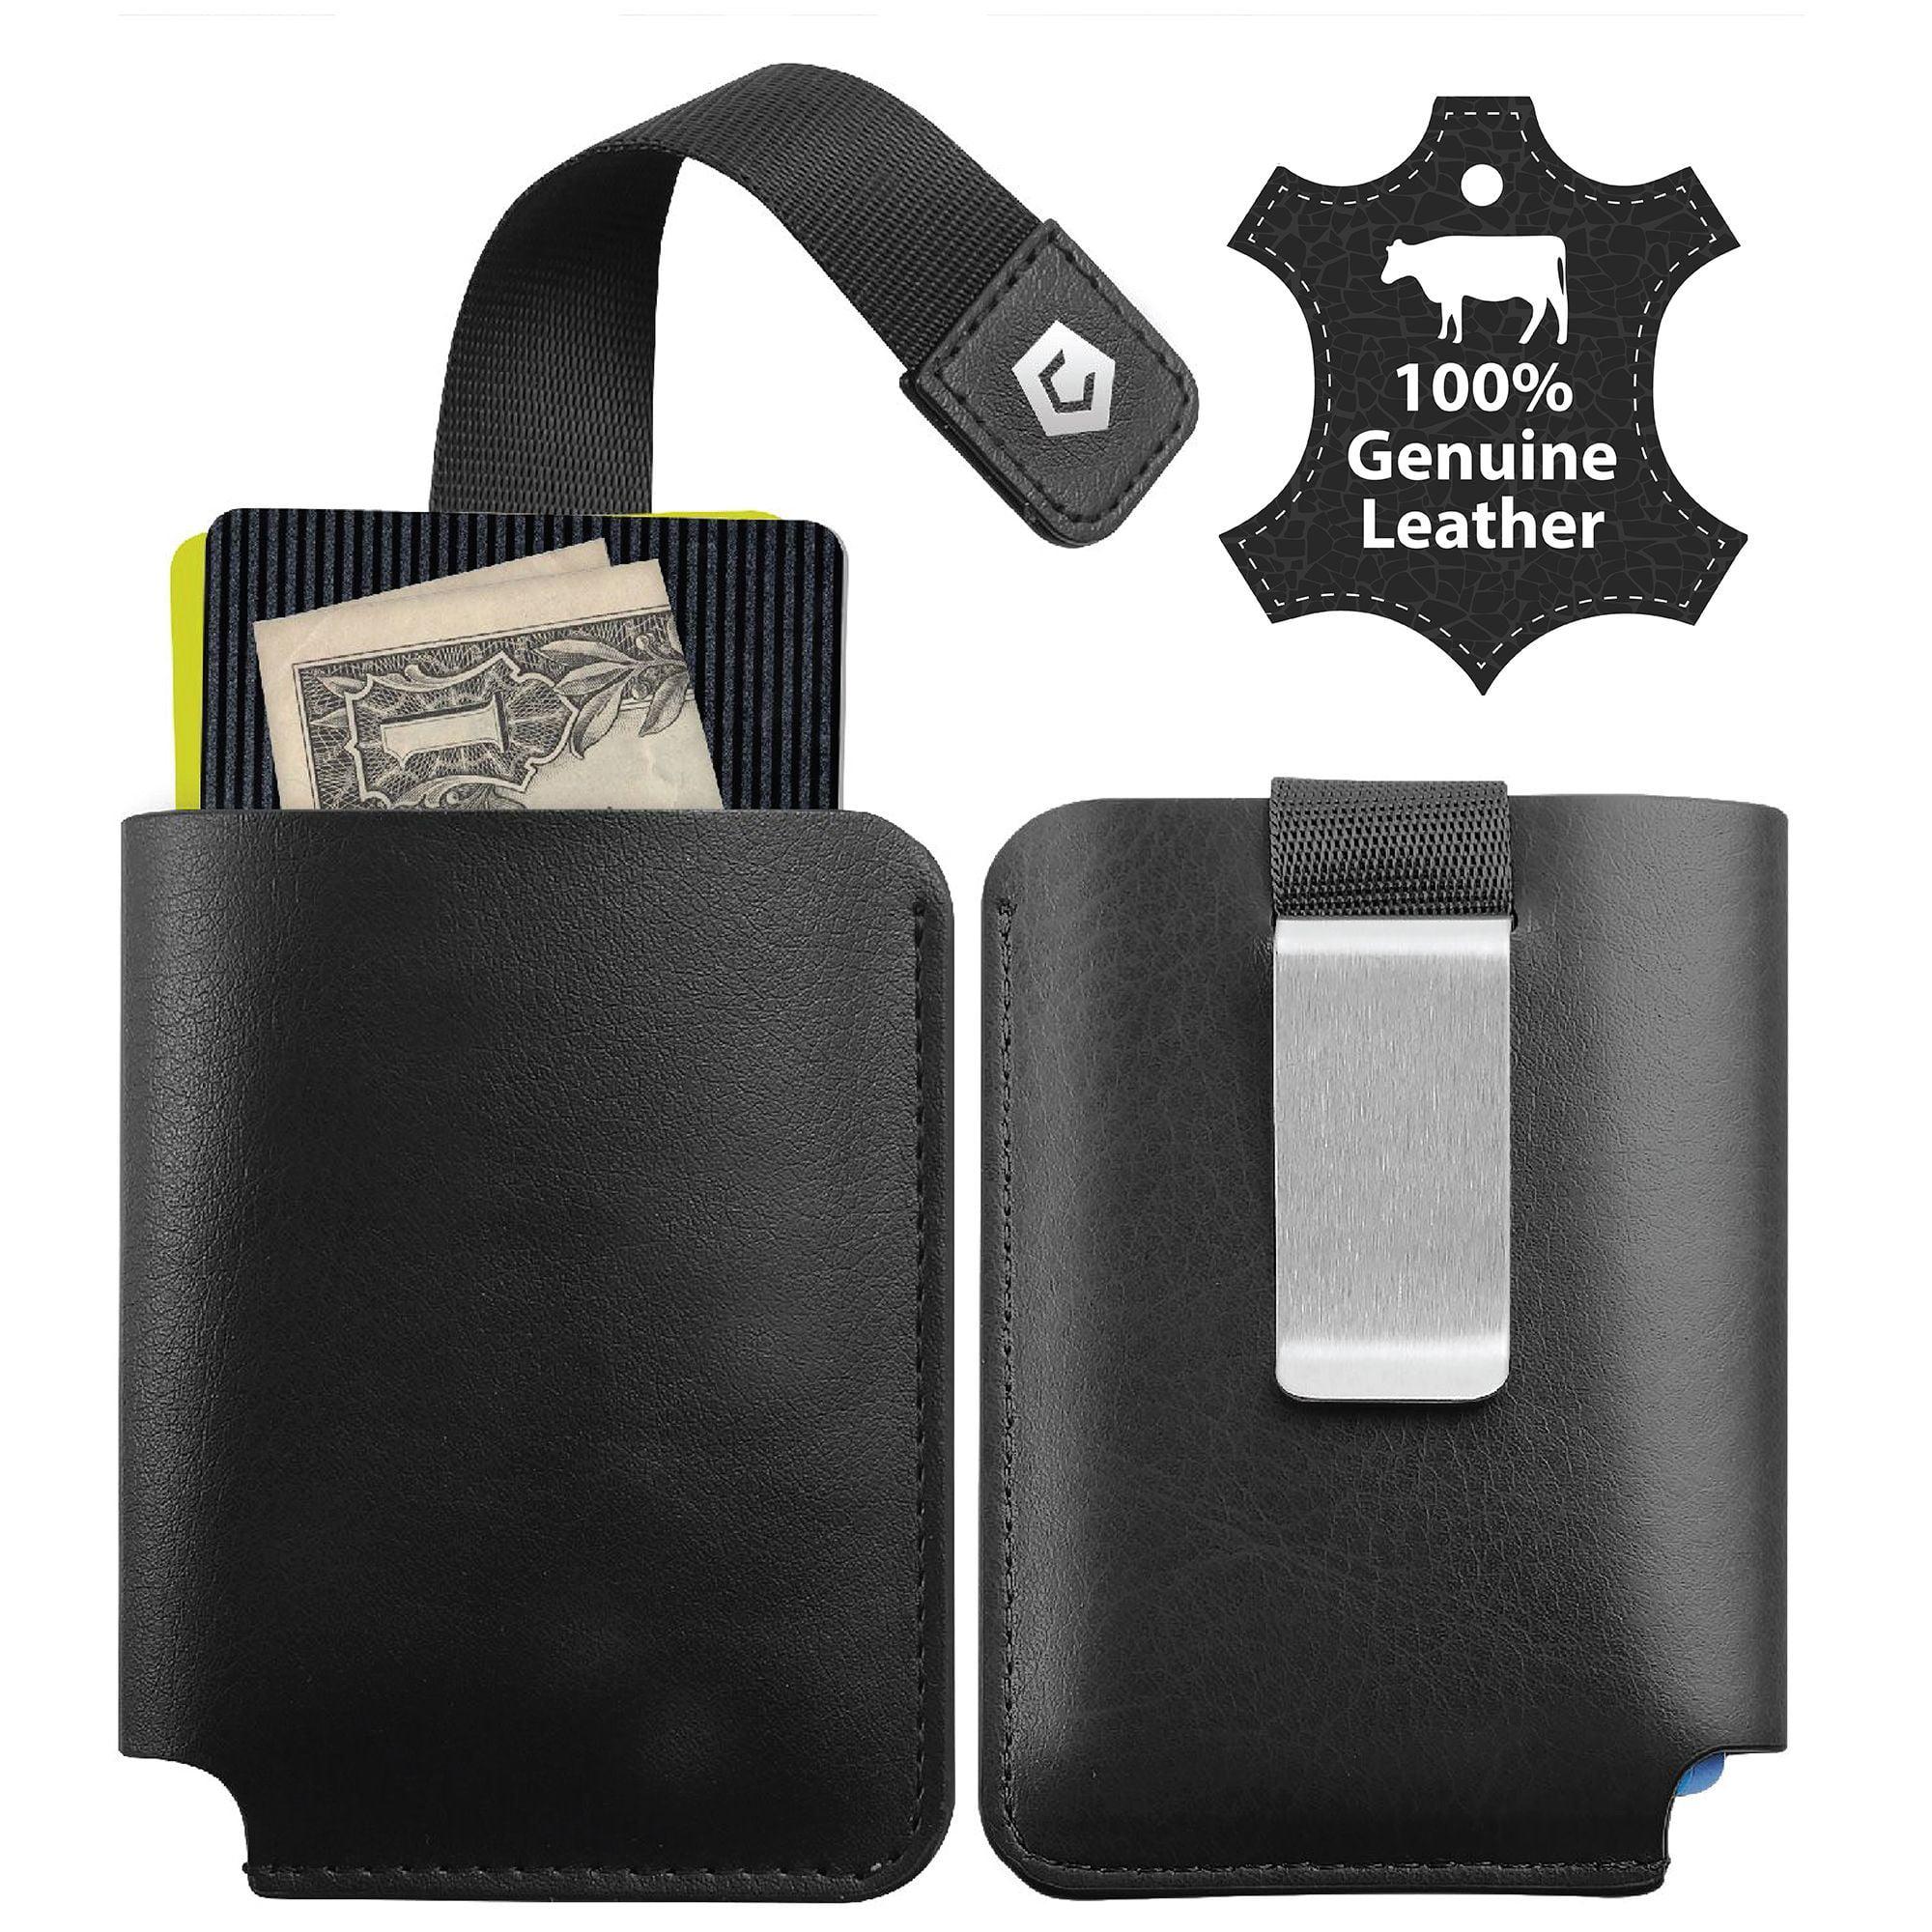 Genuine Leather Luxury Men/'s Small Id Credit Card Holder Wallet Slim Pocket Case